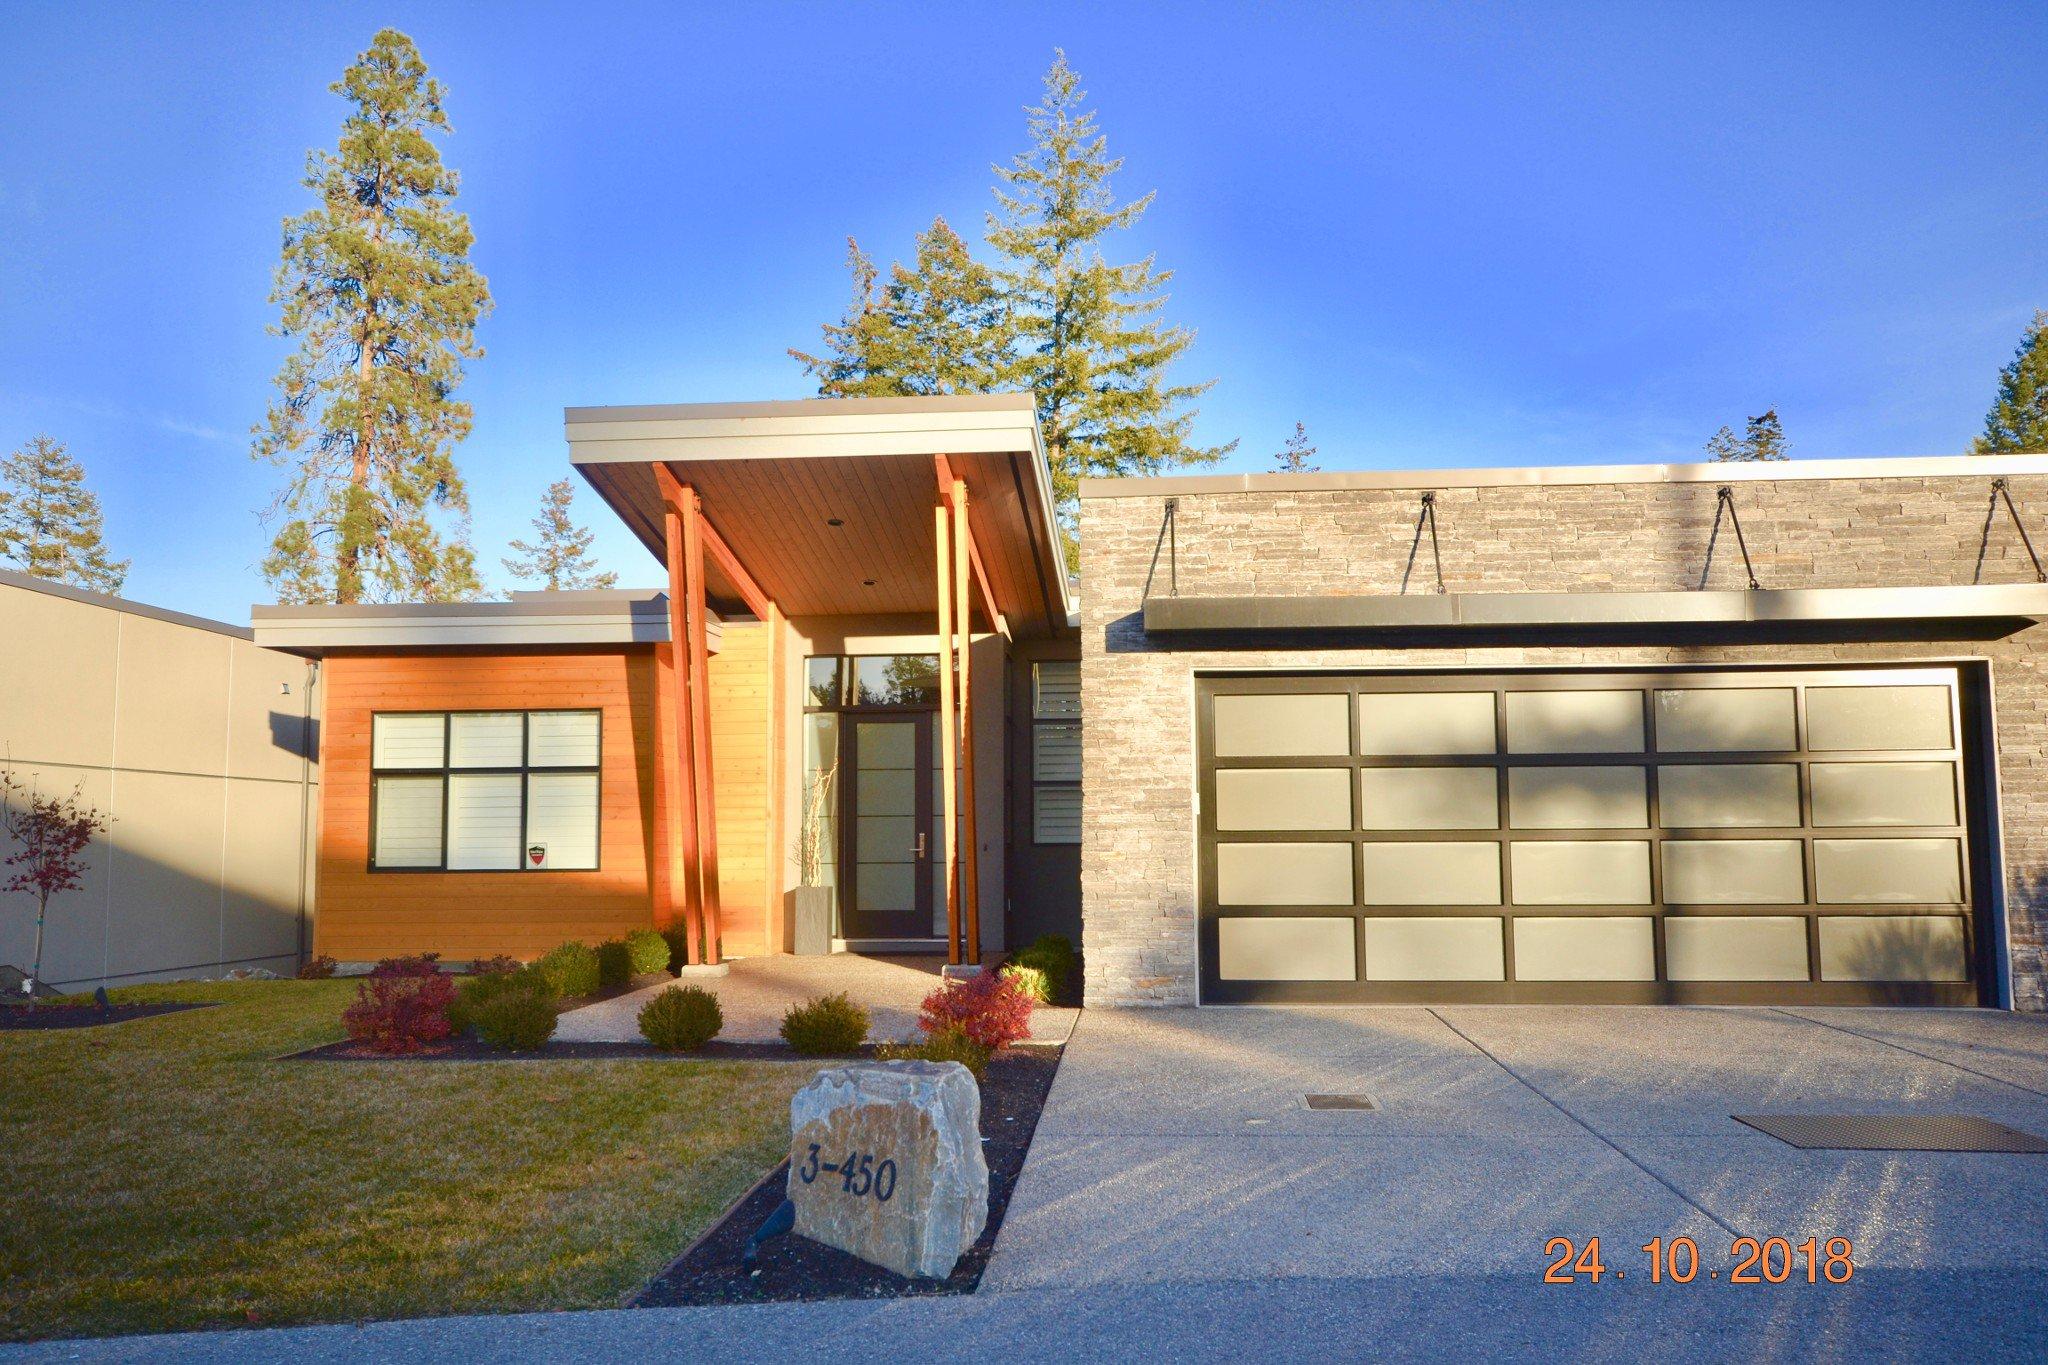 Main Photo: 3 450 Predator Ridge Drive in : Predator Ridge House for sale (Vernon)